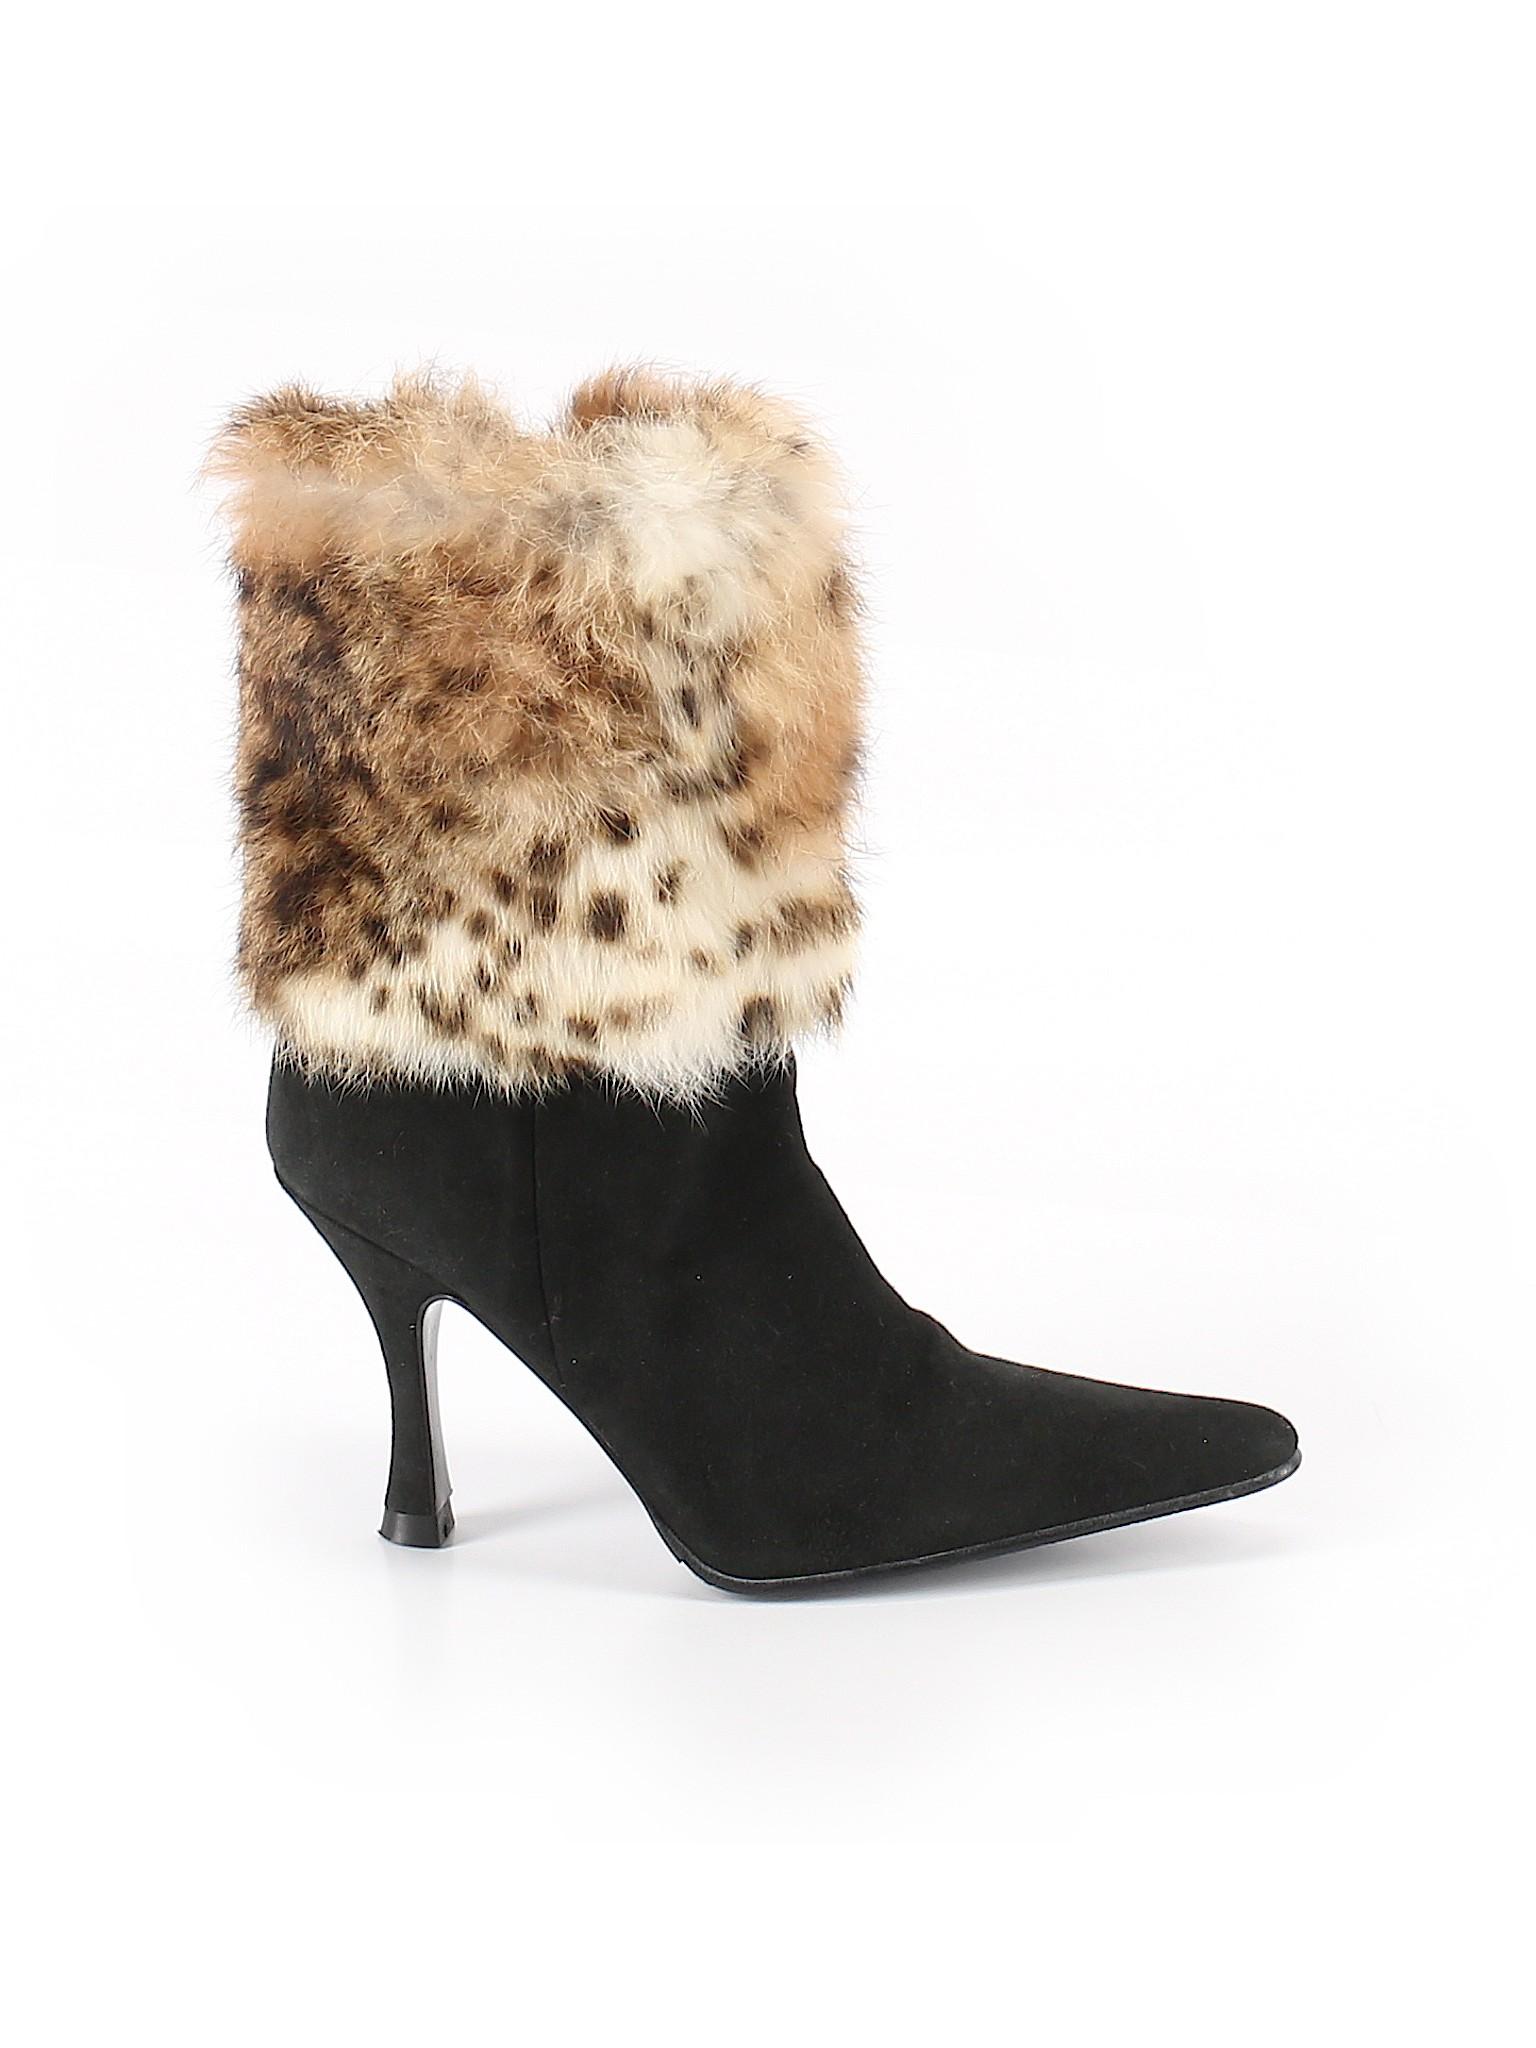 Prialpas Gomma Animal Print Black Boots Size 7 81% off